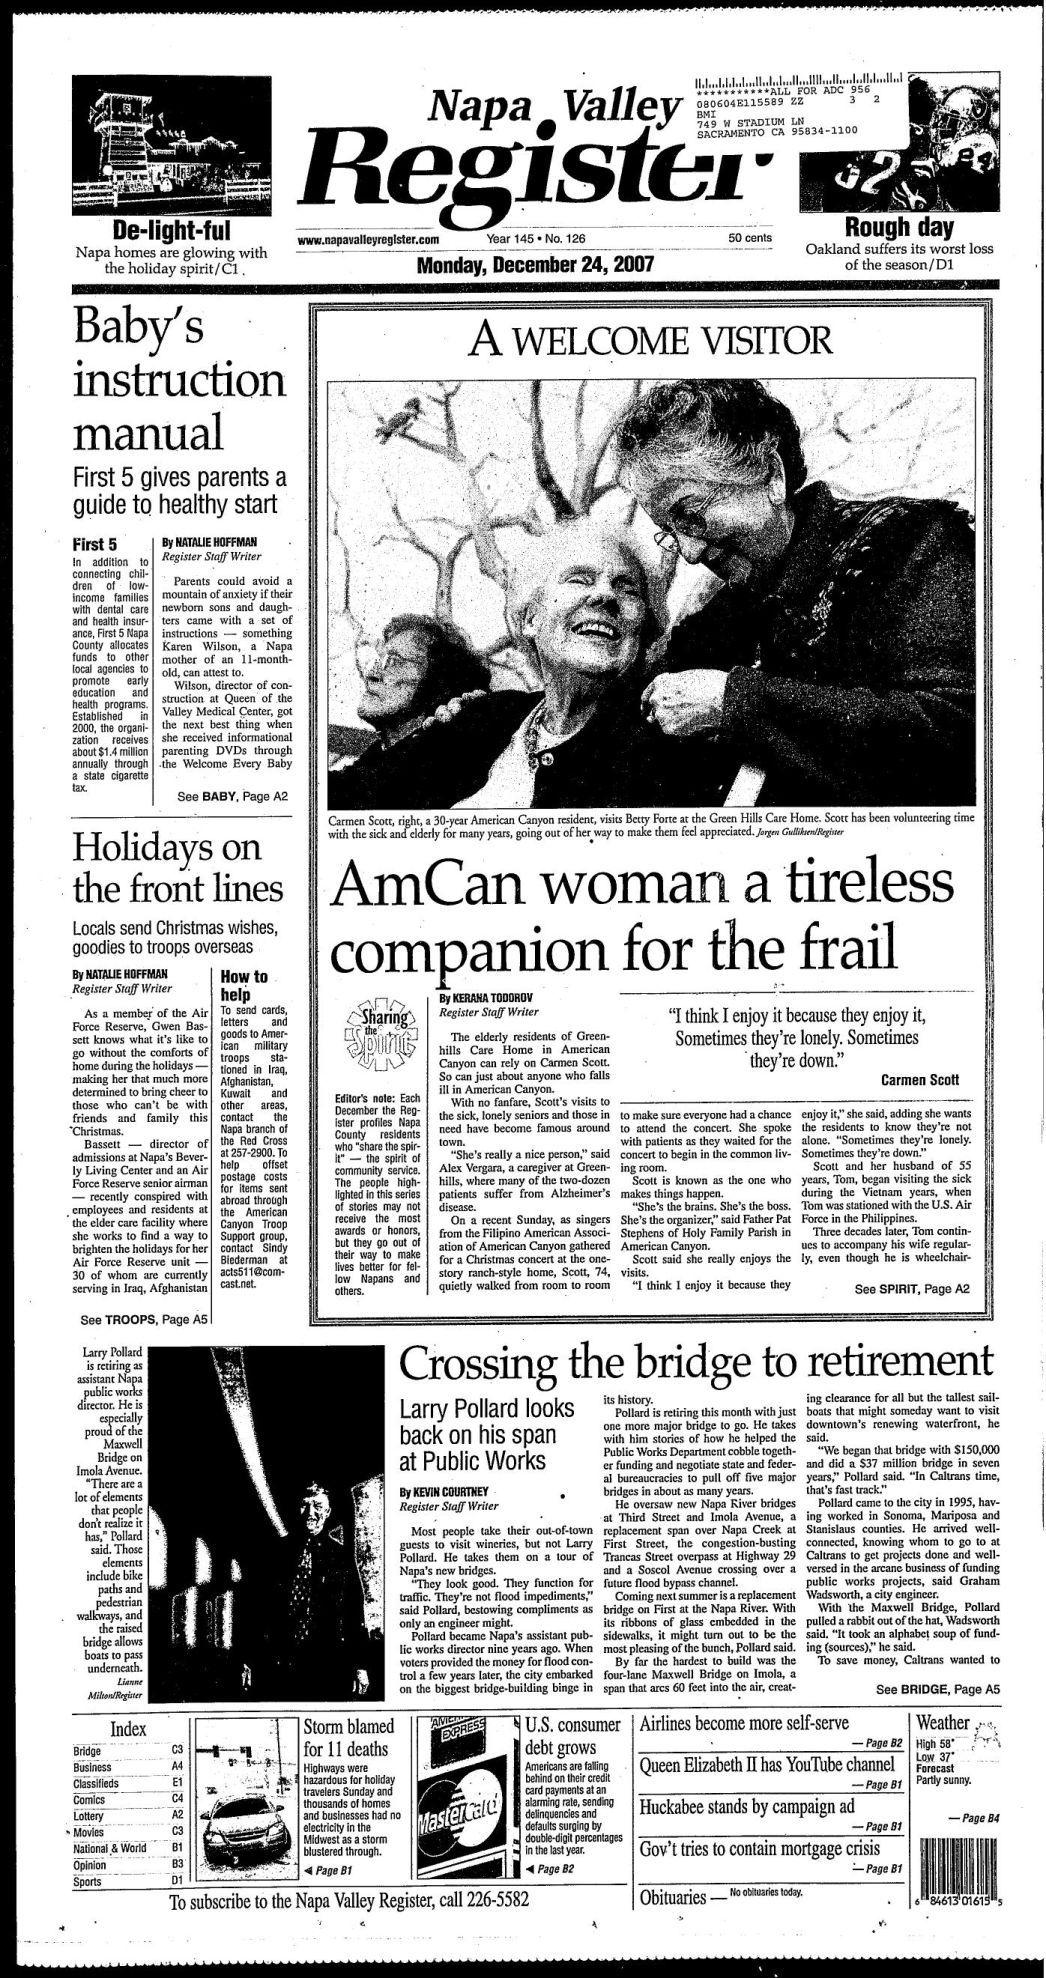 Dec. 24, 2007